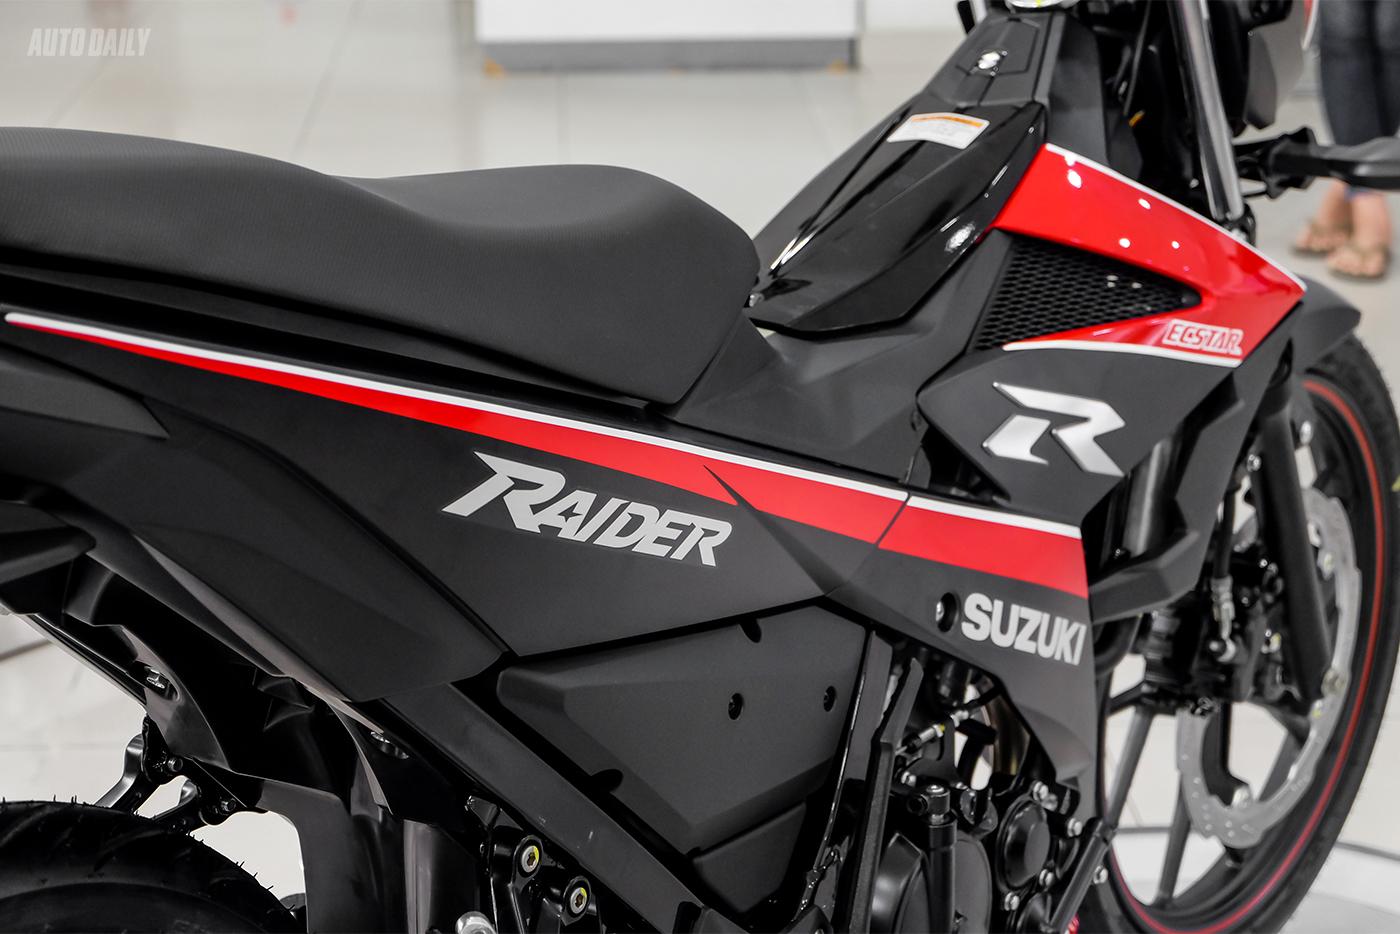 suzuki-raider-r150-fi-yoshimura-5.jpg